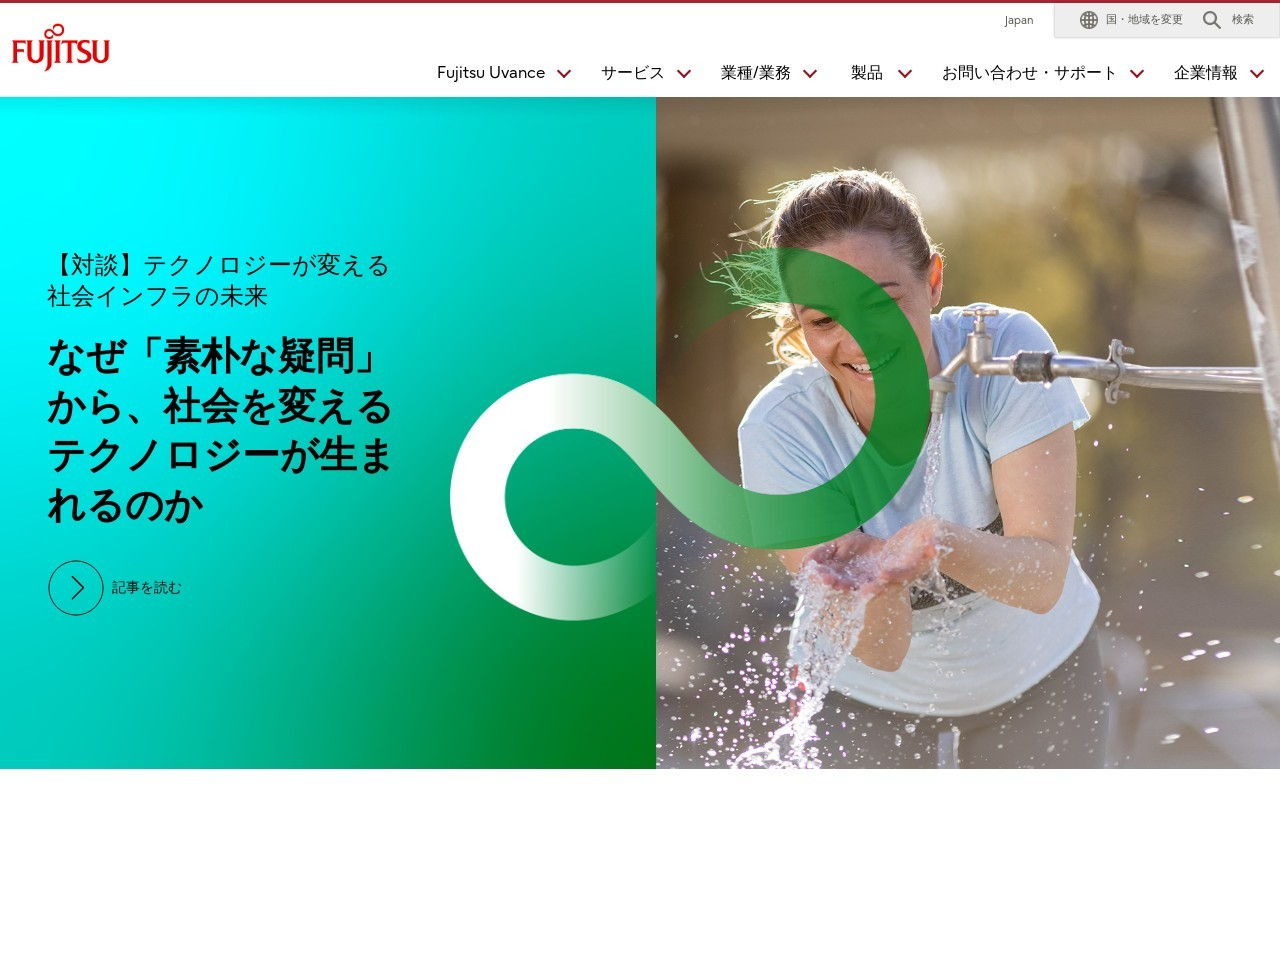 http://jp.fujitsu.com/solutions/ip/